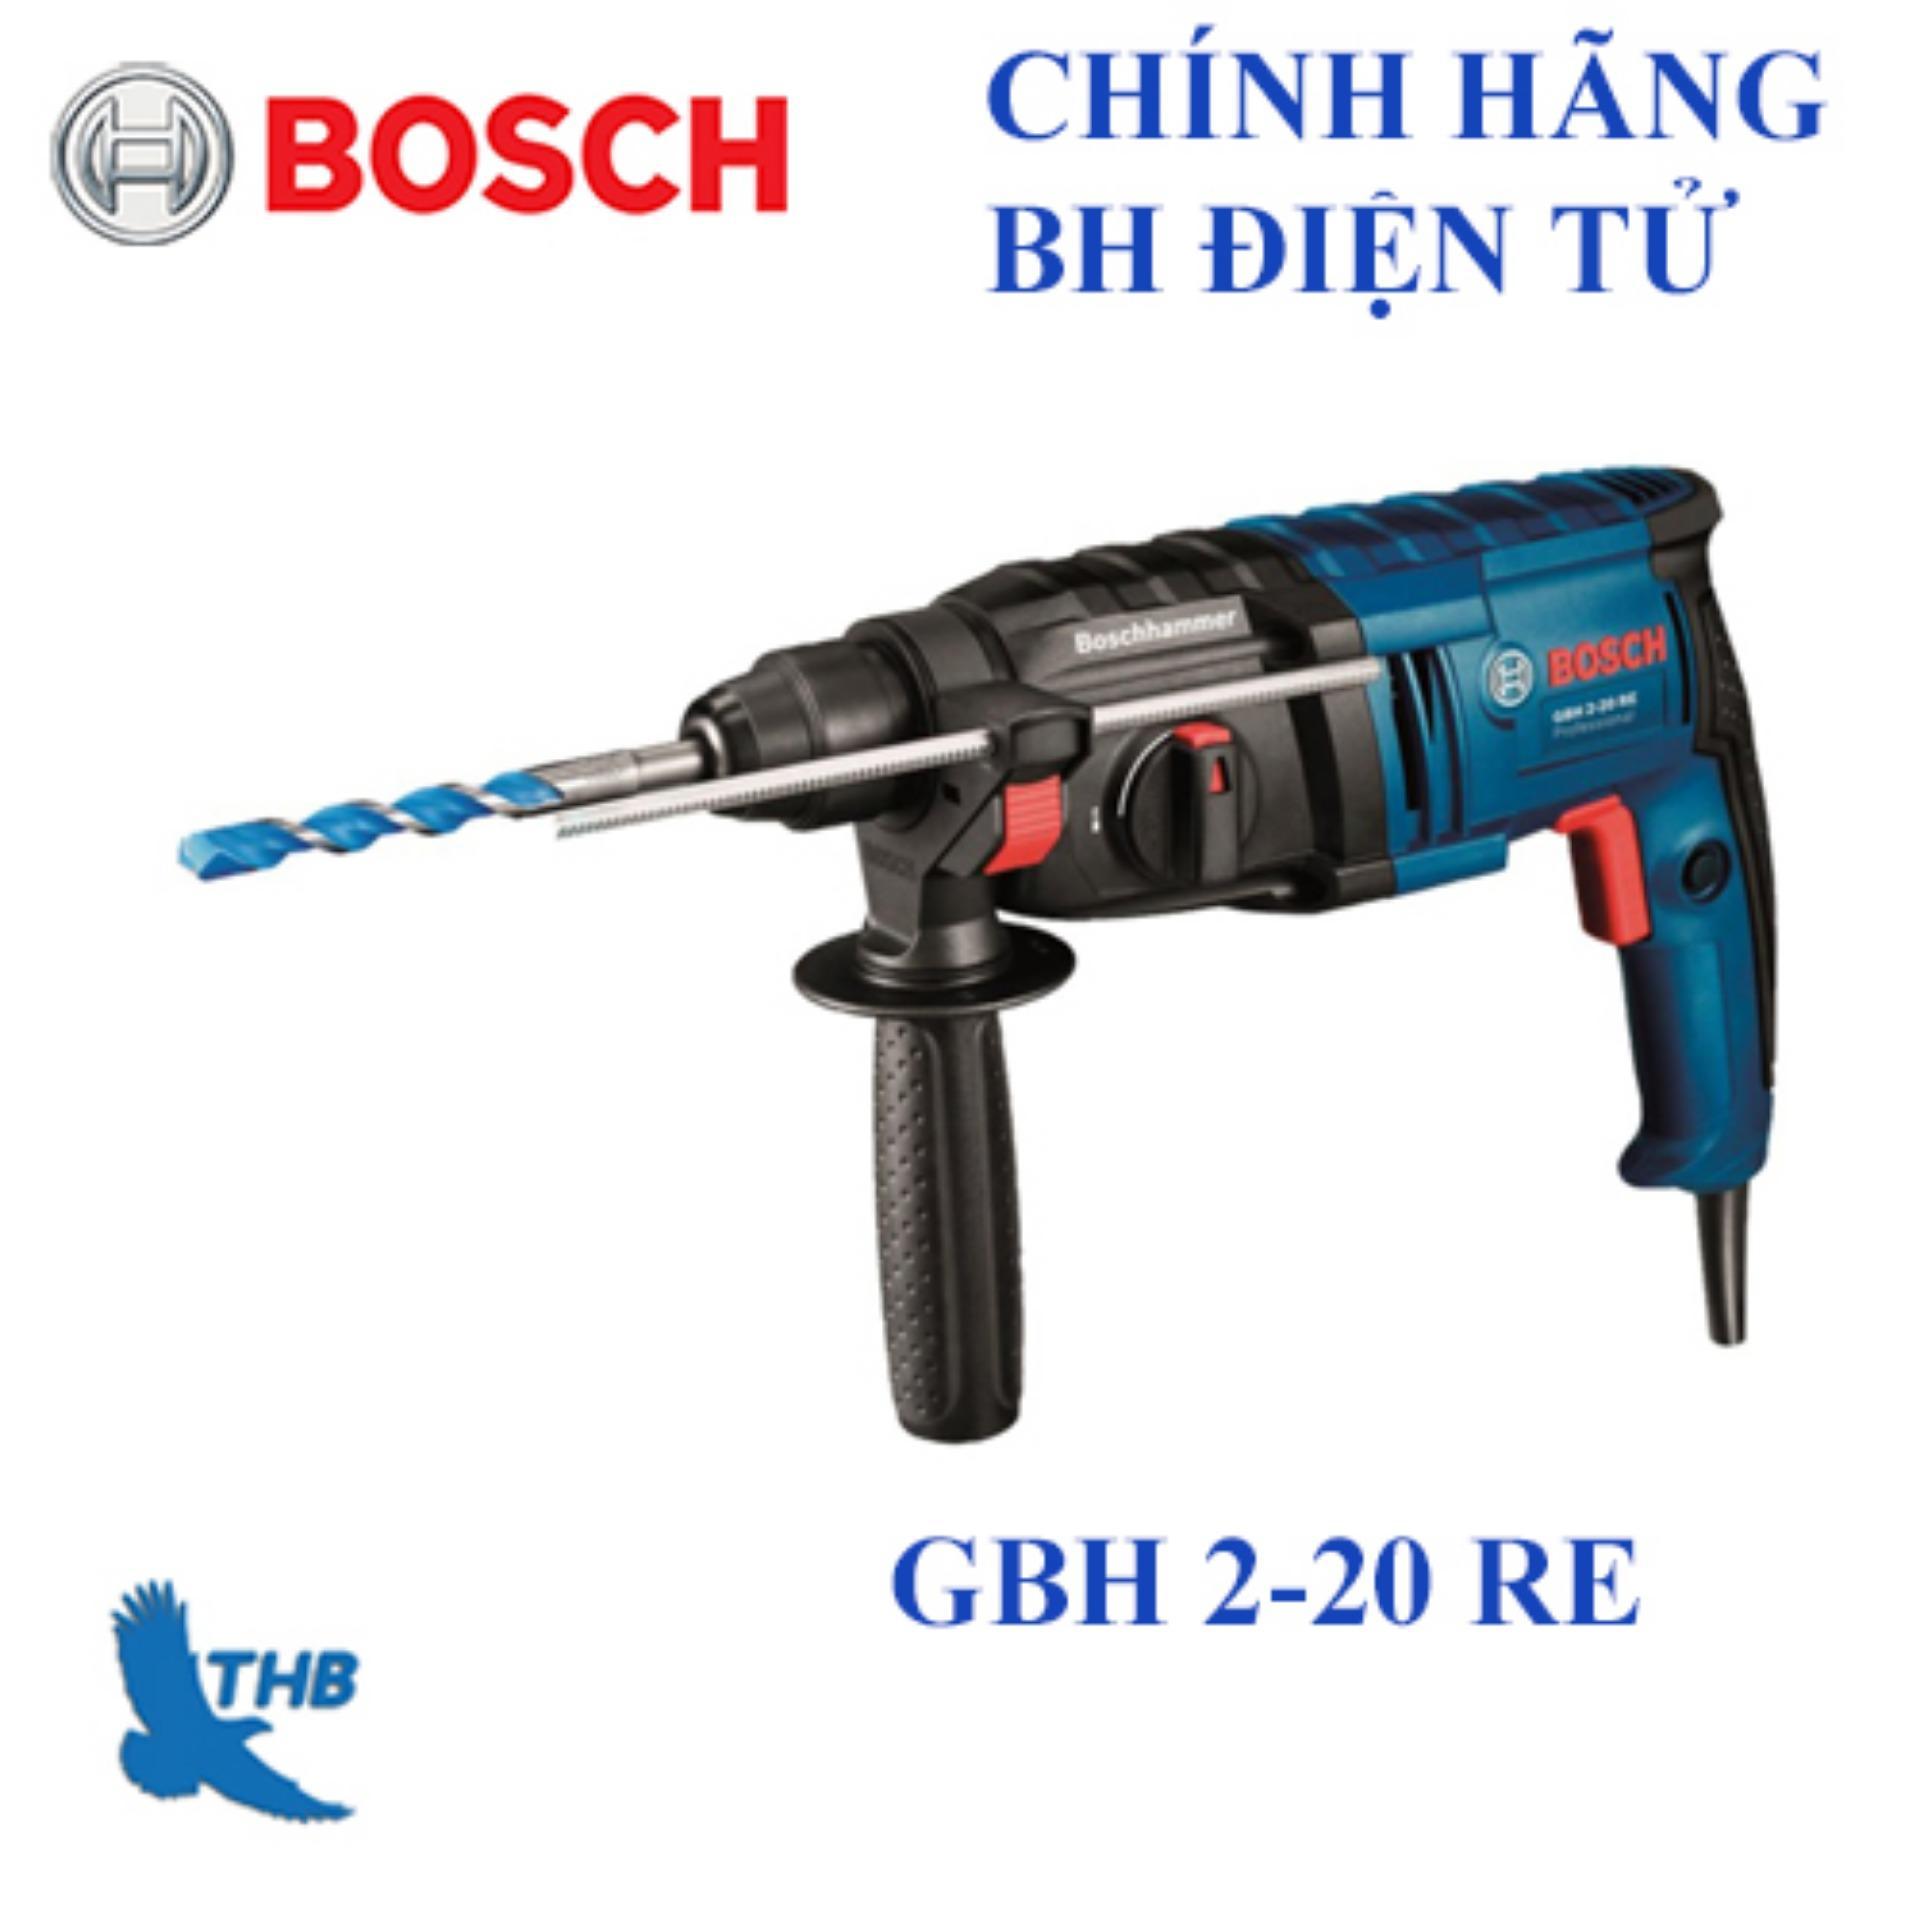 Máy khoan búa Bosch GBH 2-20 RE